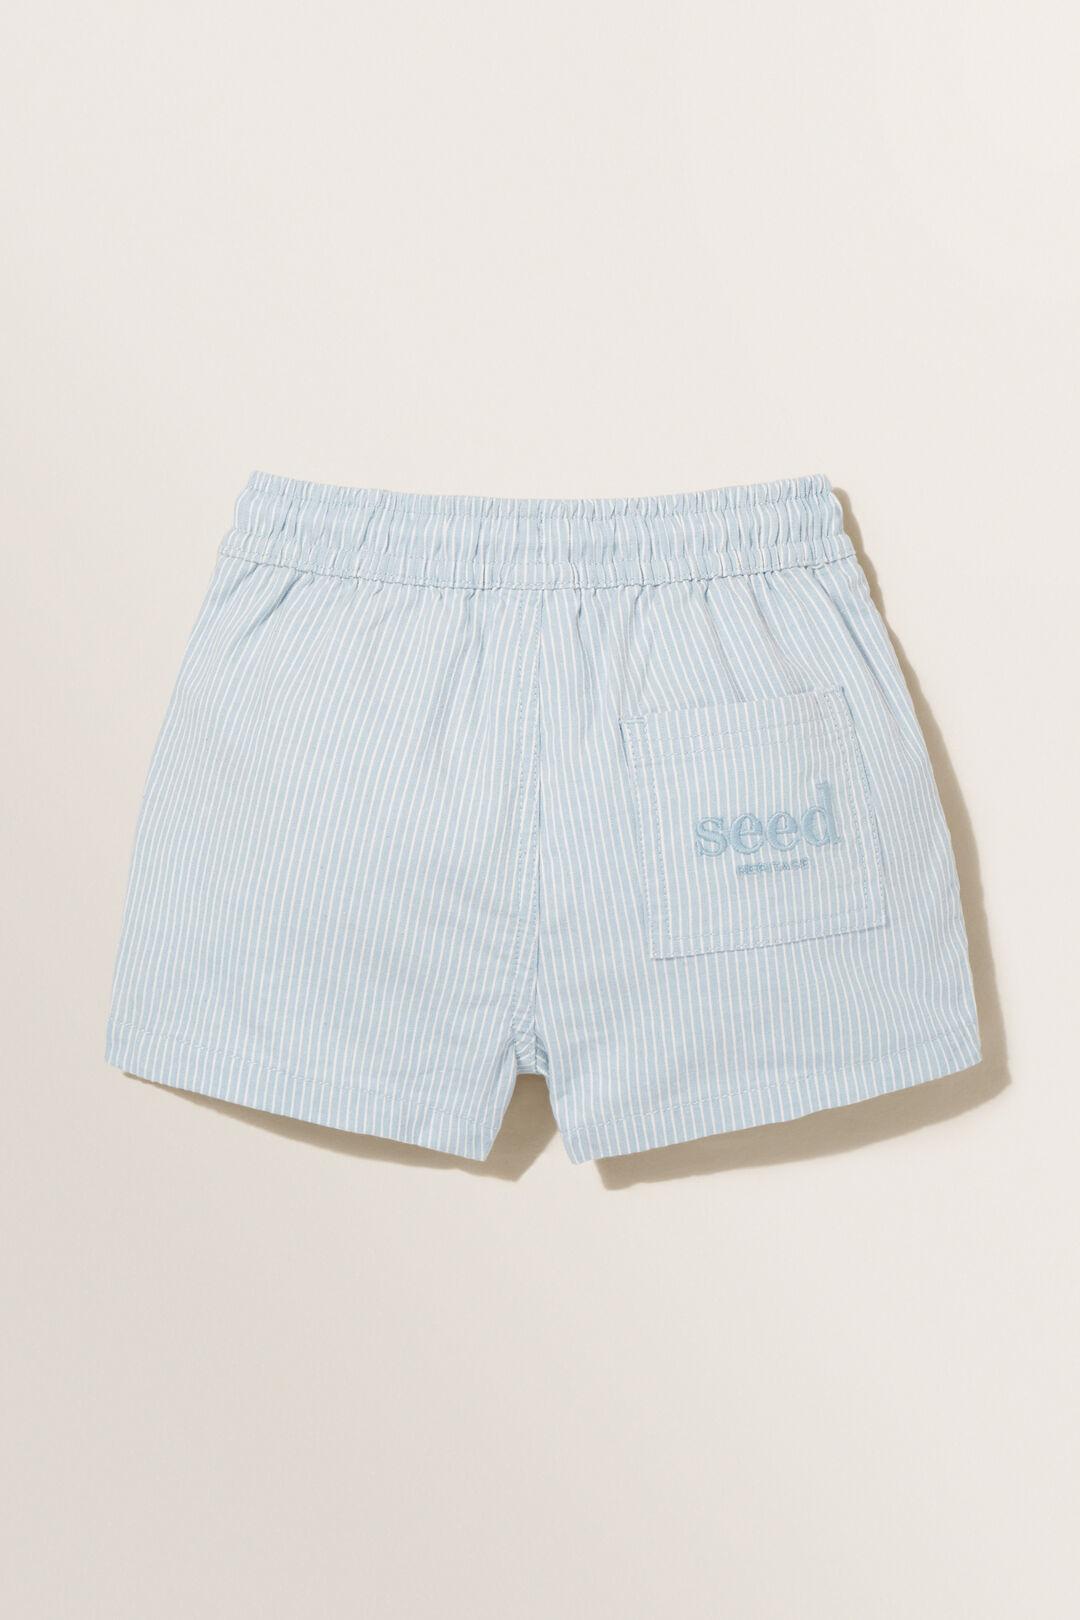 Logo Shorts  Blue Stripe  hi-res